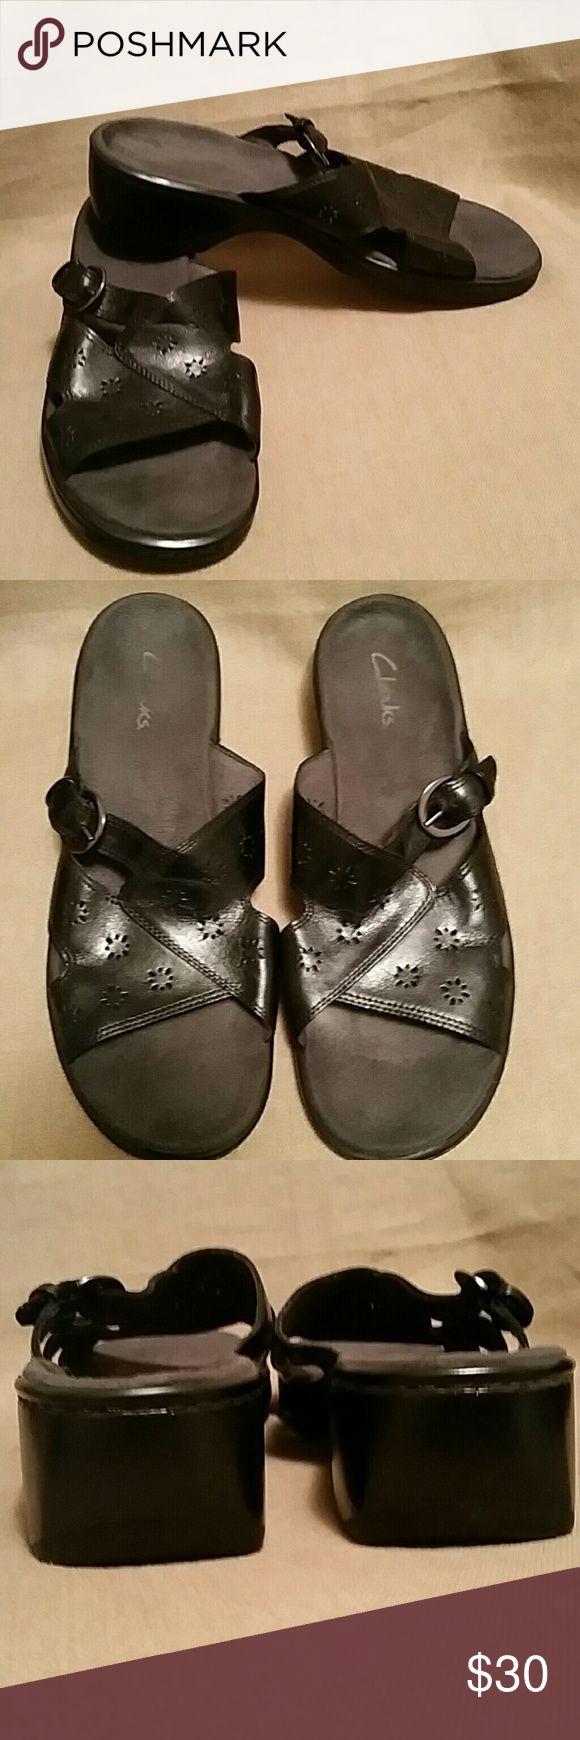 EUC Clarks sandals black leather laser cut  comfy Leather upper, balance man made materials.   Buckle makes them adjustable.  Laser cutout design.  Size is 11M....medium width. Clarks Shoes Sandals